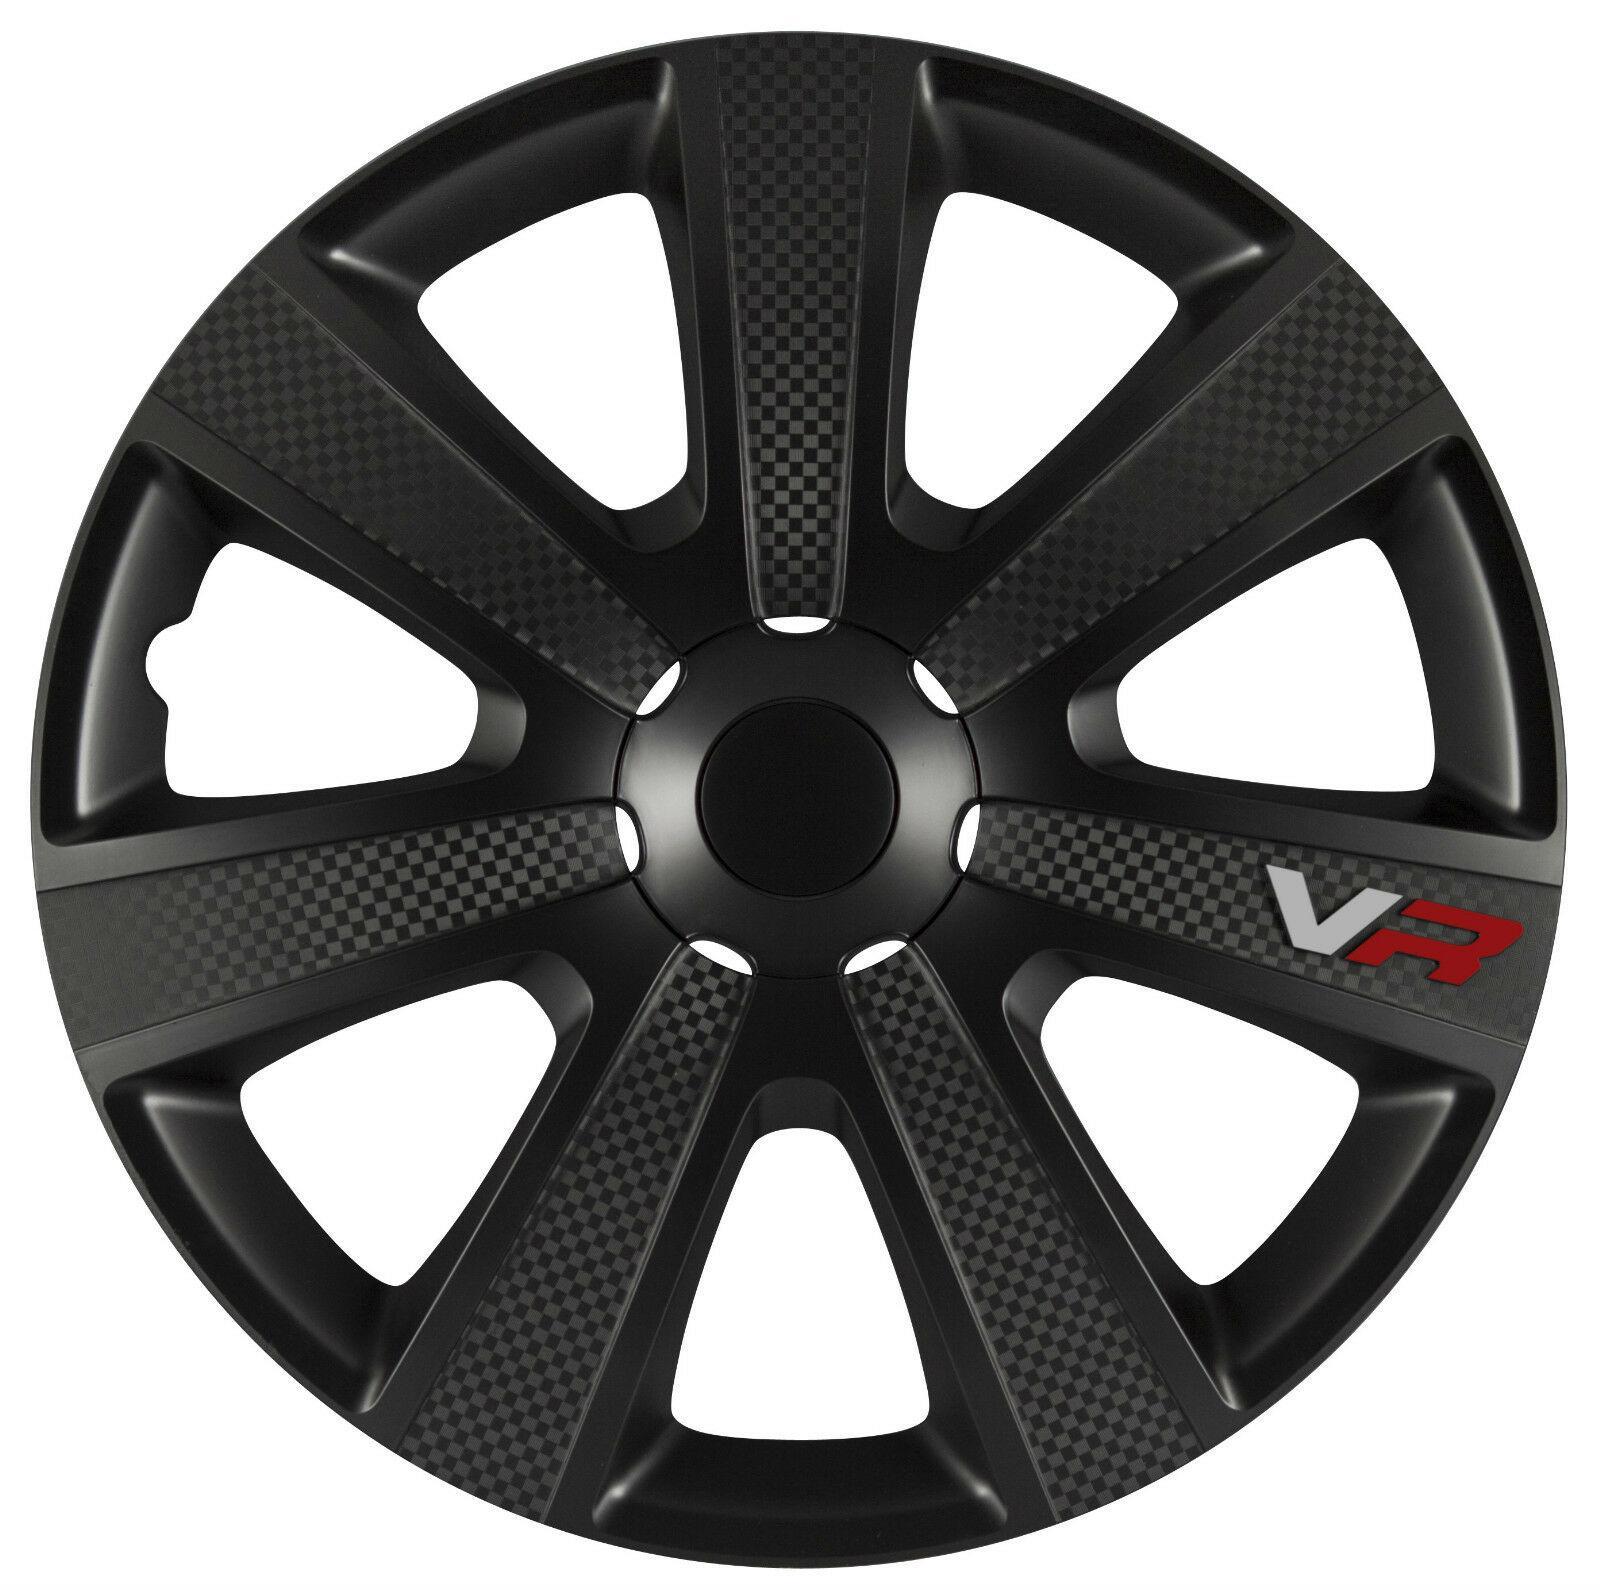 Wheel trims ARGO 16 VR BLACK 5906197741106